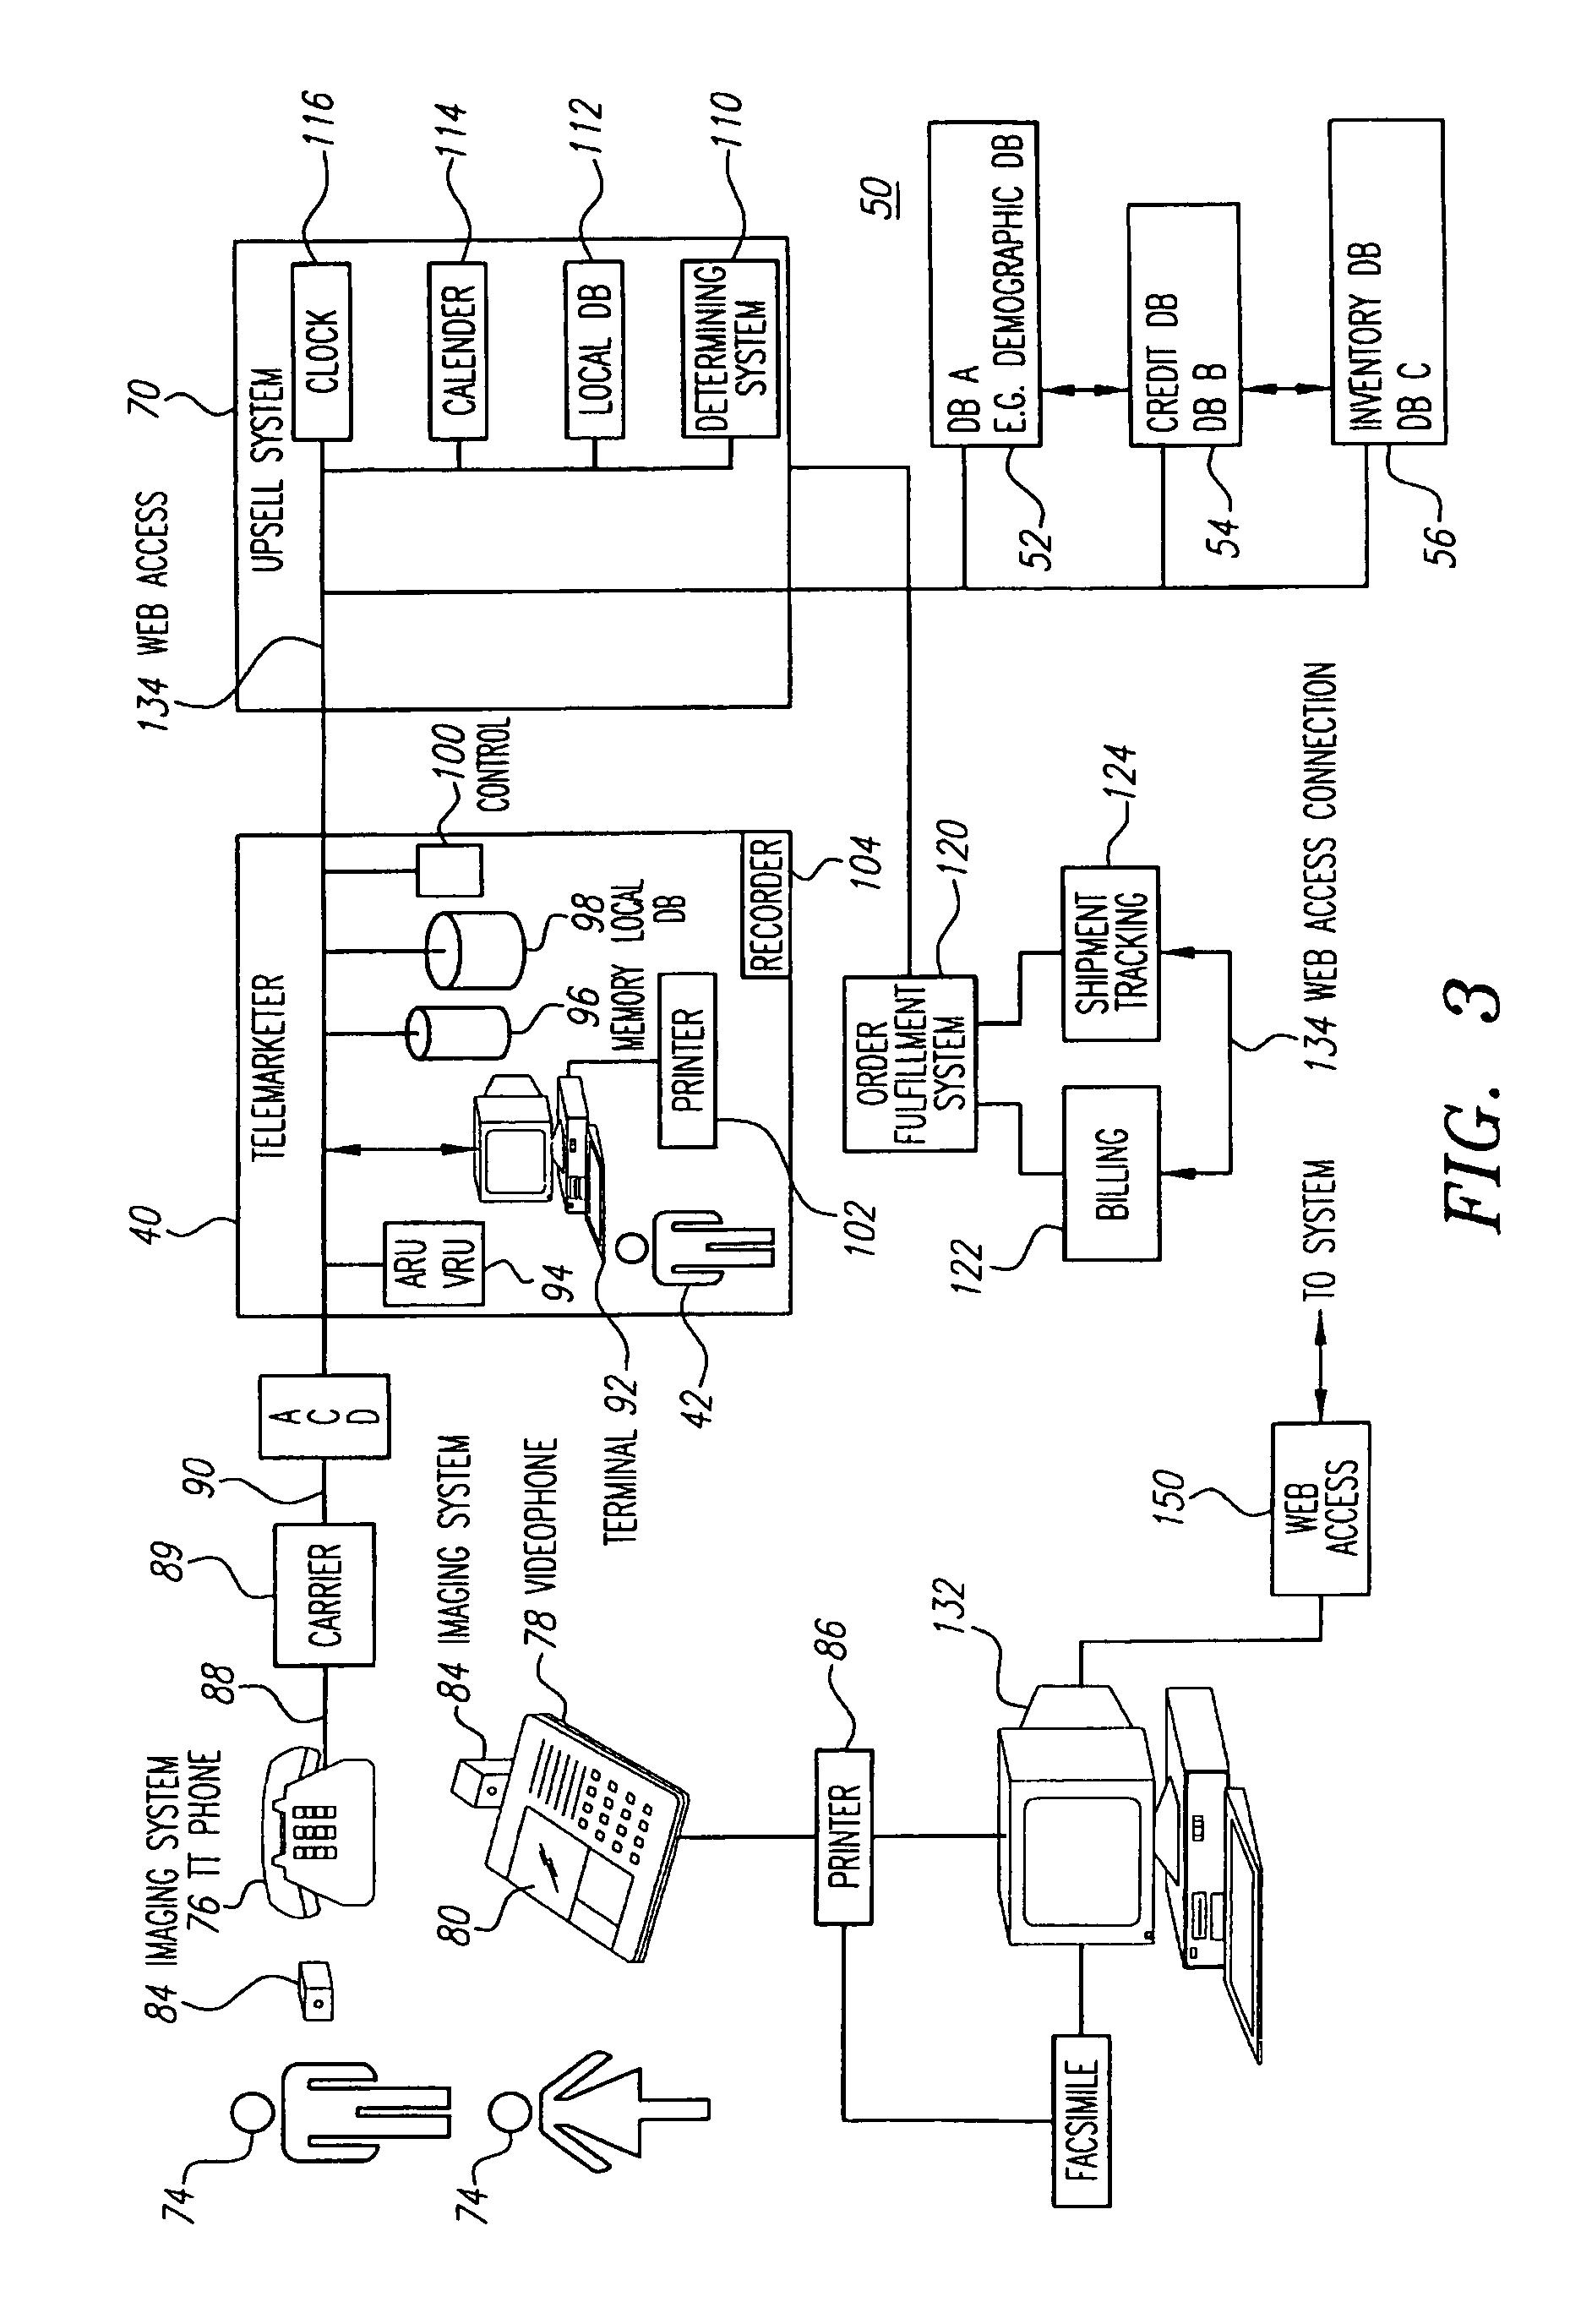 sm50 wiring diagram 65 pontiac wiring diagram